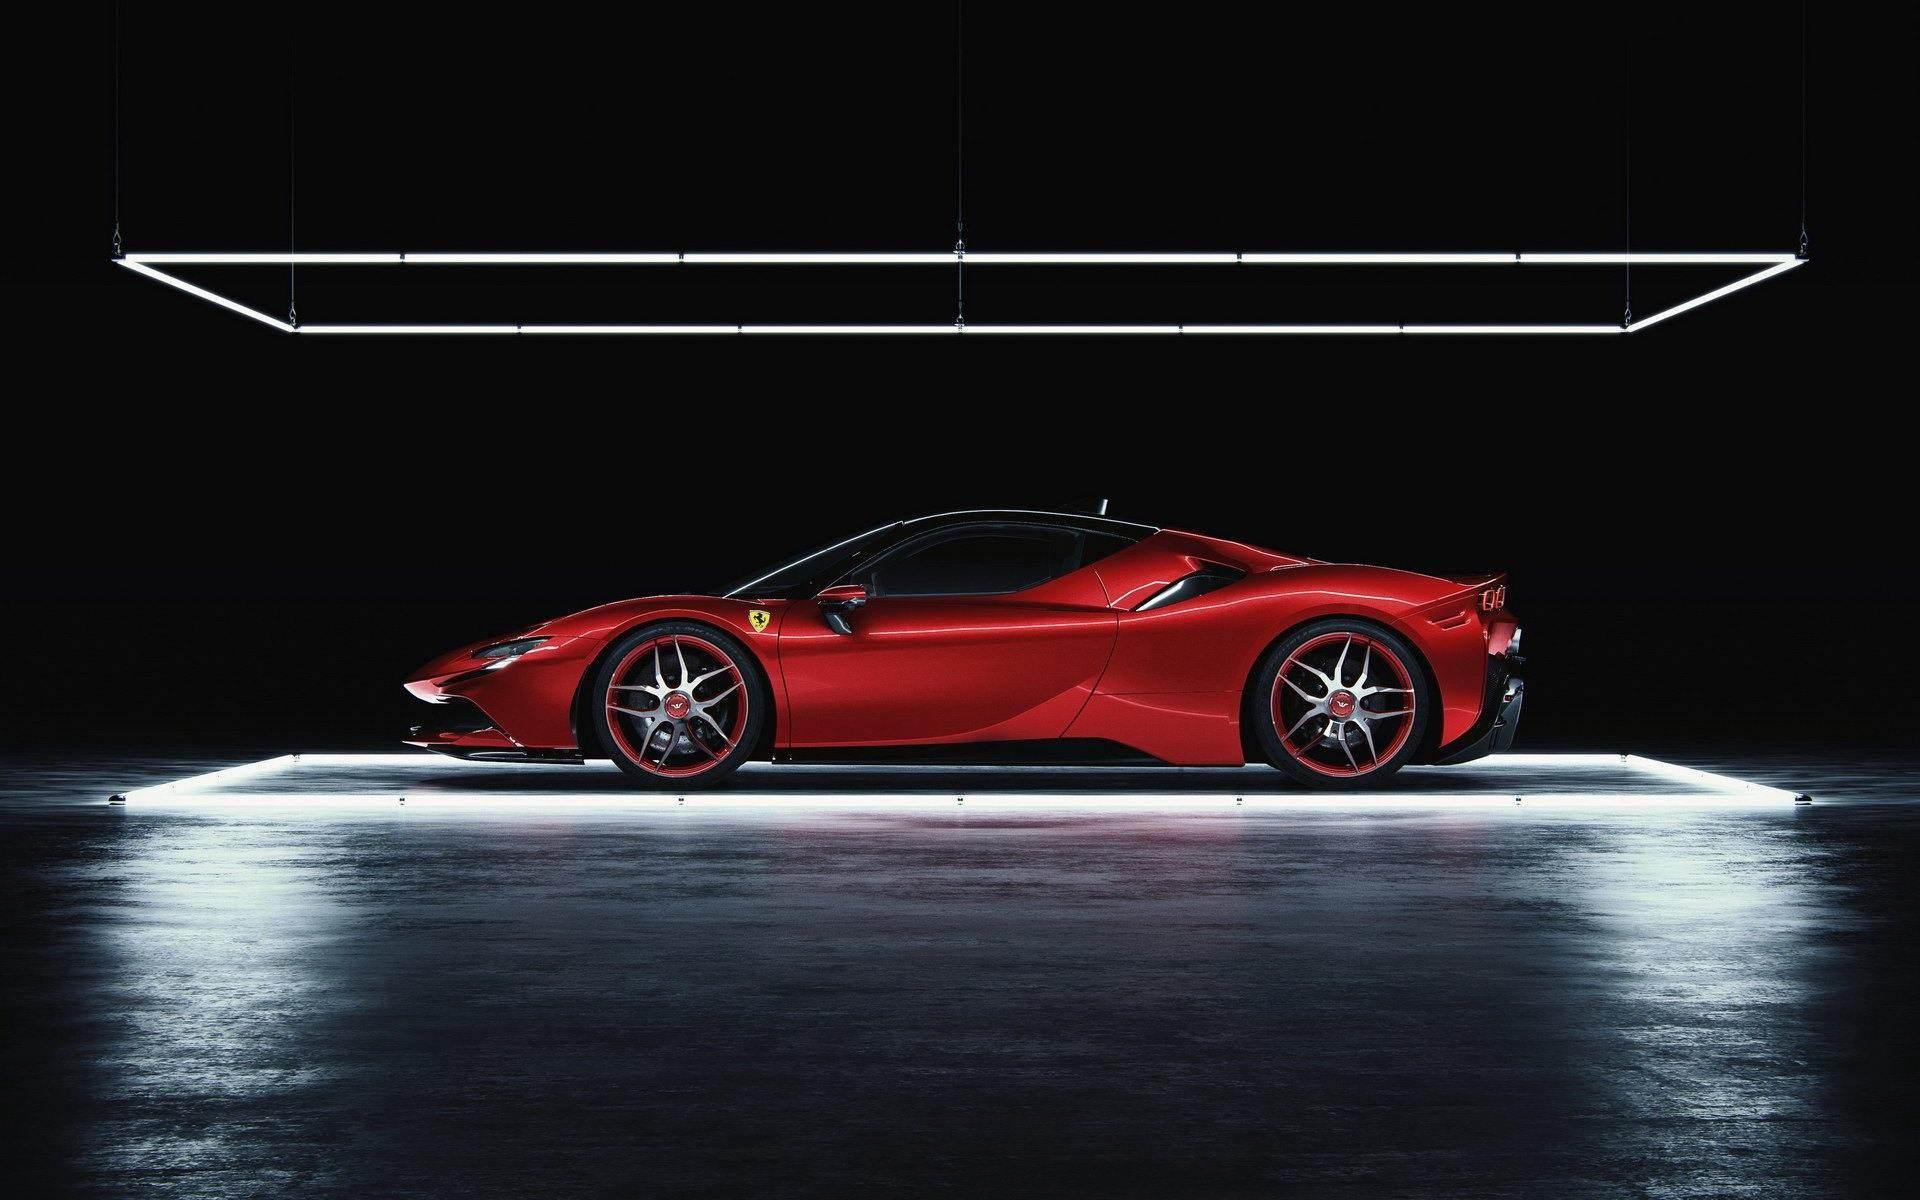 Ferrari_SF90_Stradale_by_Wheelsandmore_0010